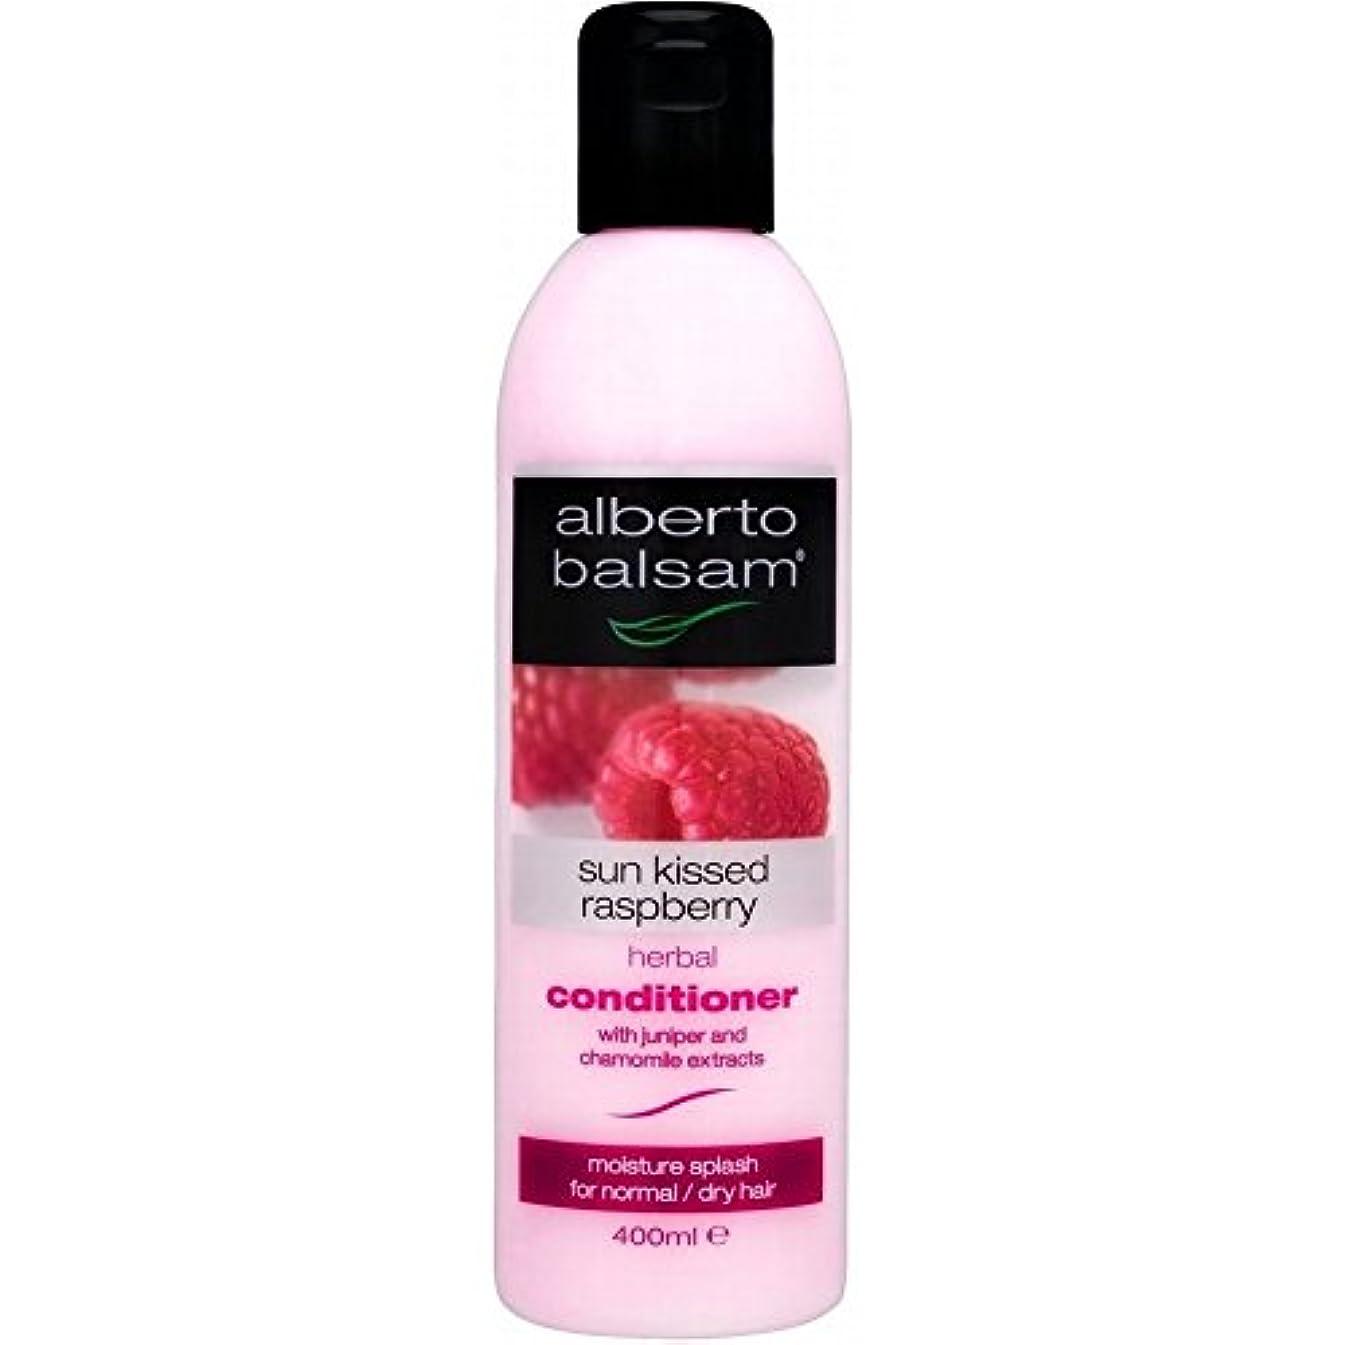 Alberto Balsam Herbal Conditioner - Sun Kissed Raspberry (400ml) アルベルトバルサムハーブコンディショナー - 太陽は( 400ミリリットル)ラズベリーキス...